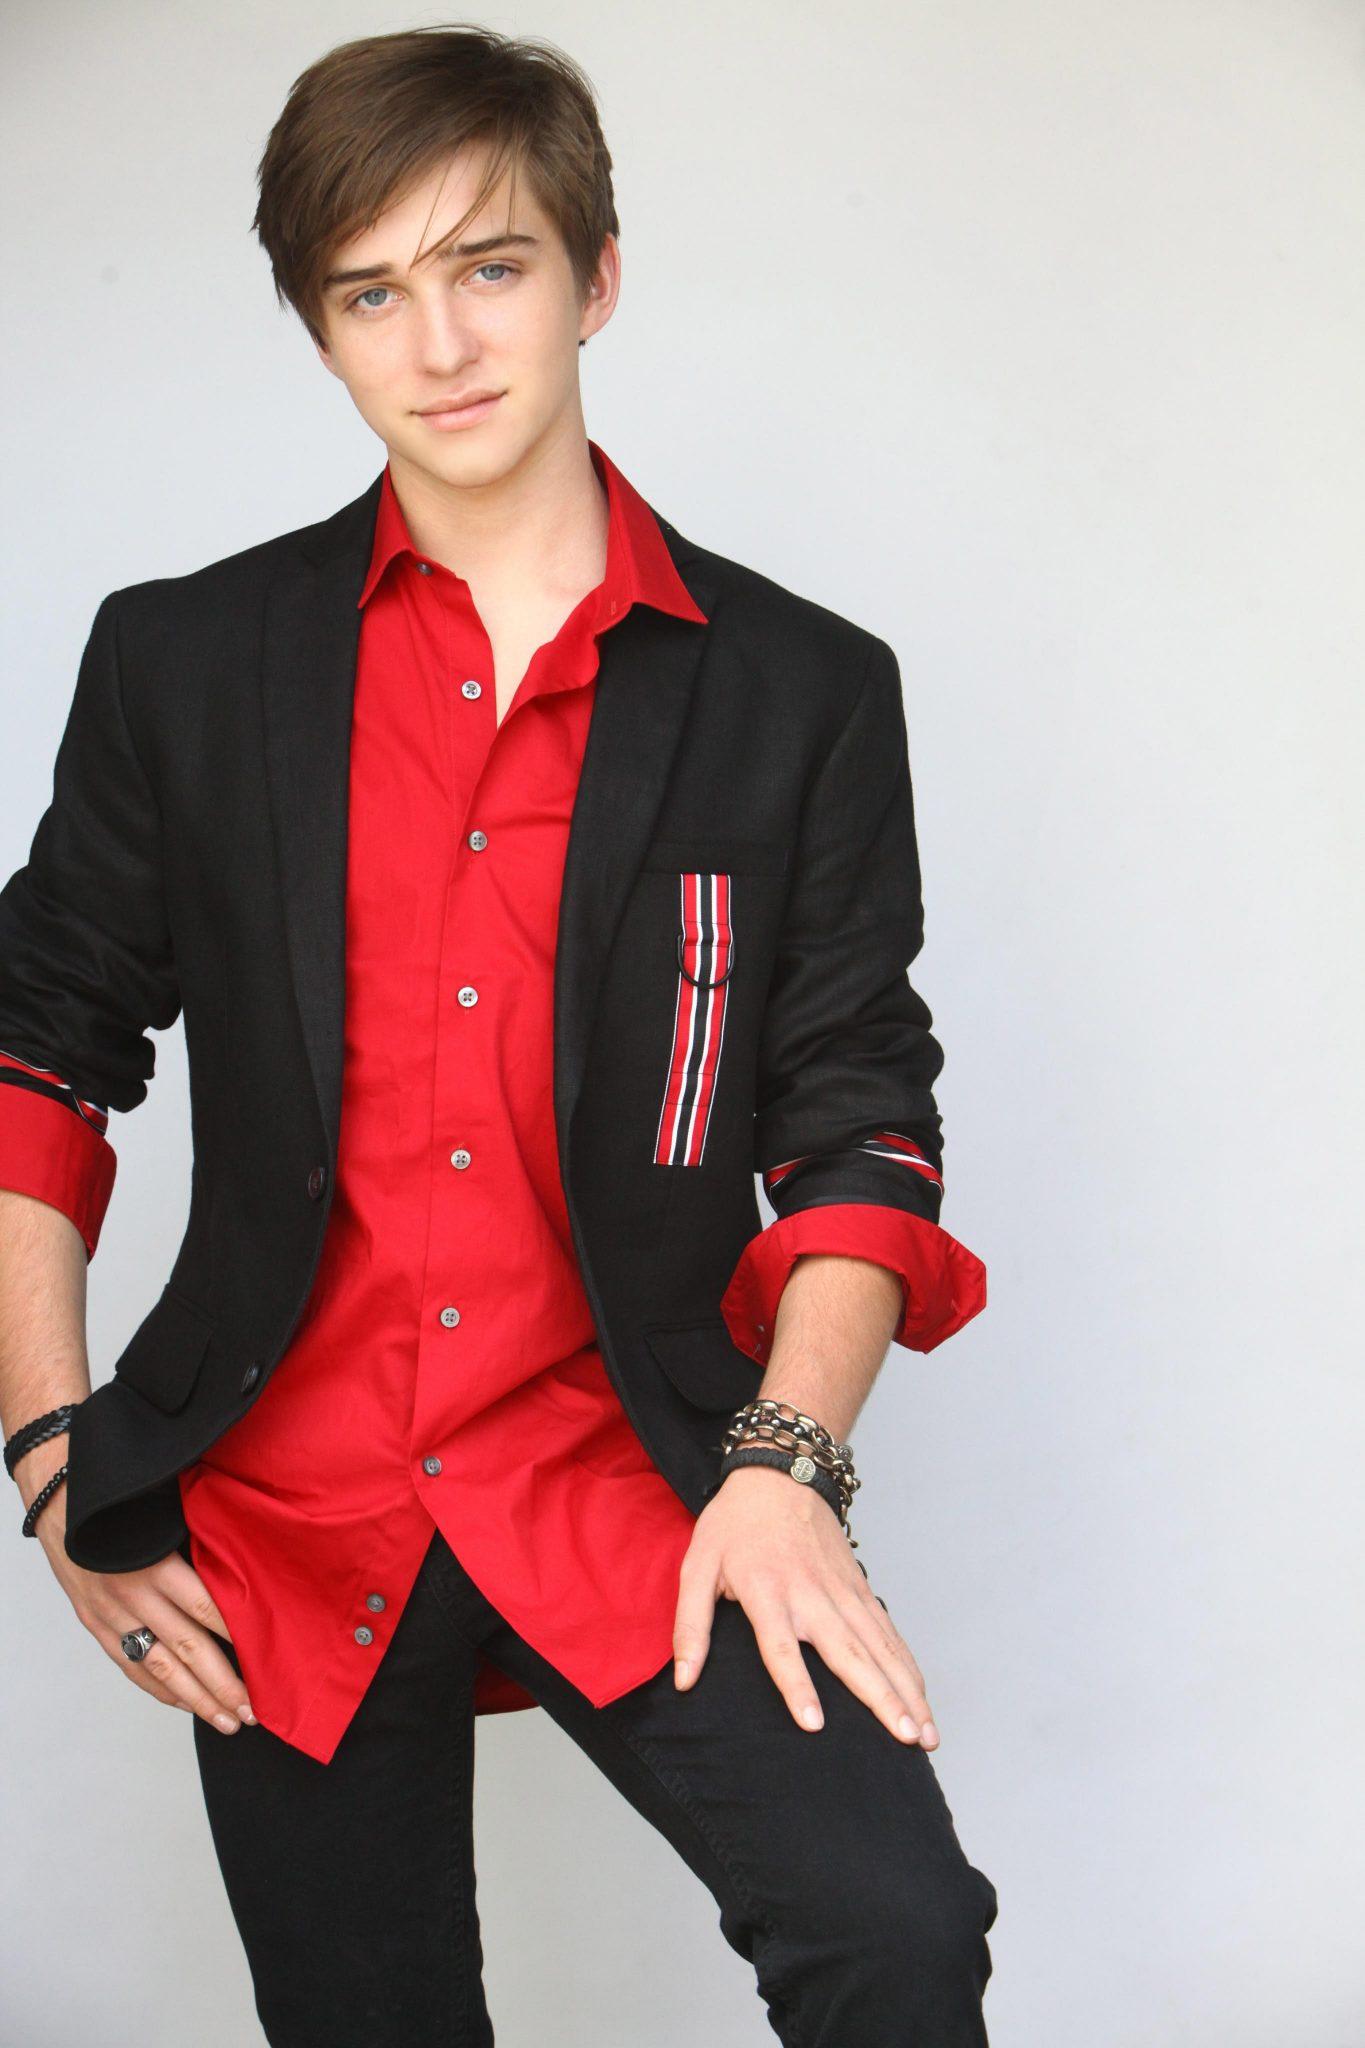 Michael as Jackson Fuller